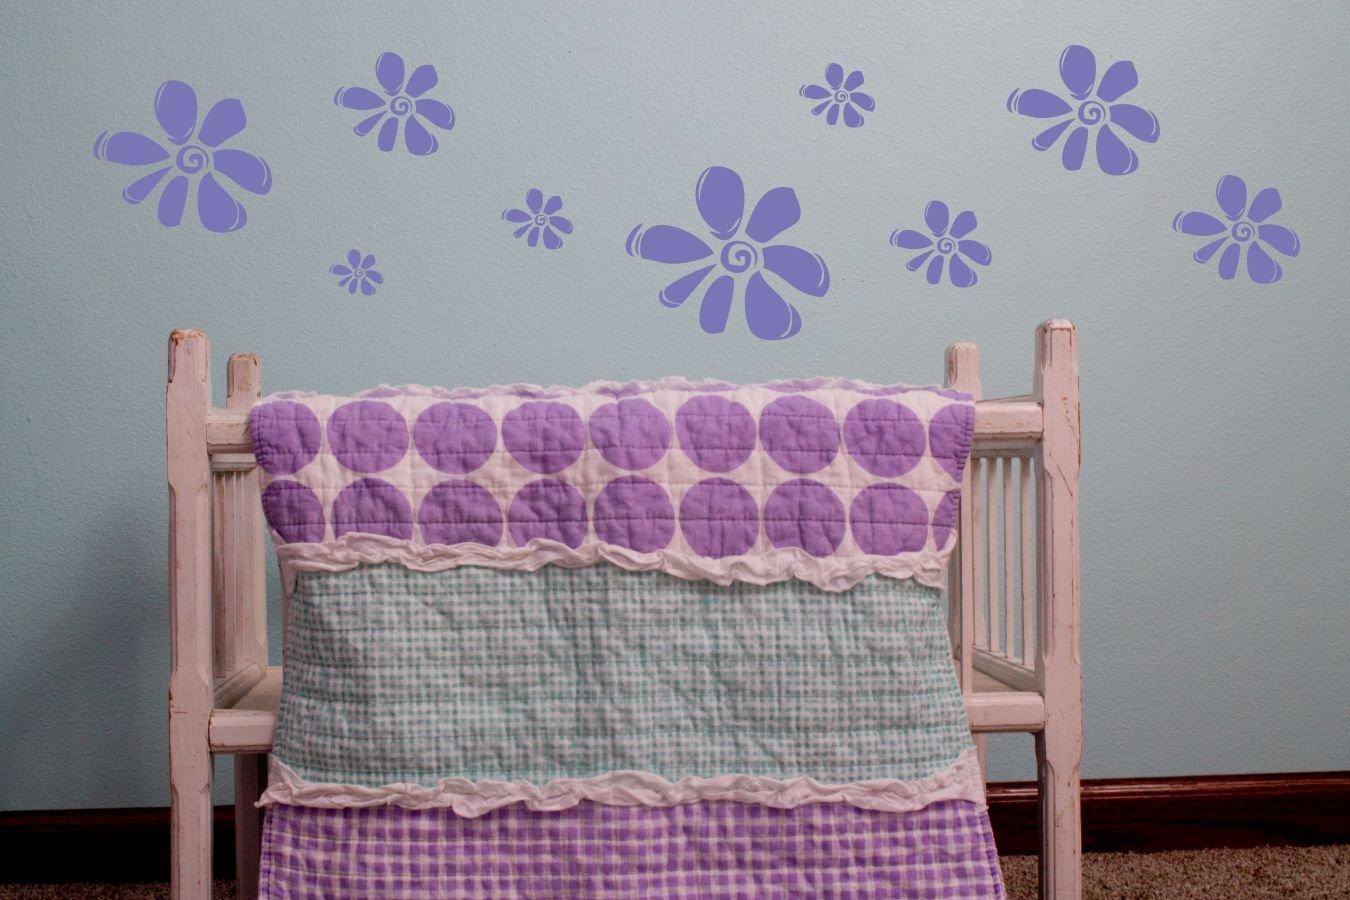 Wall Decor Plus More WDPM160 Purple GirlS Wall Sticker Flower Decals 9Pc Large Floral Decor Purple